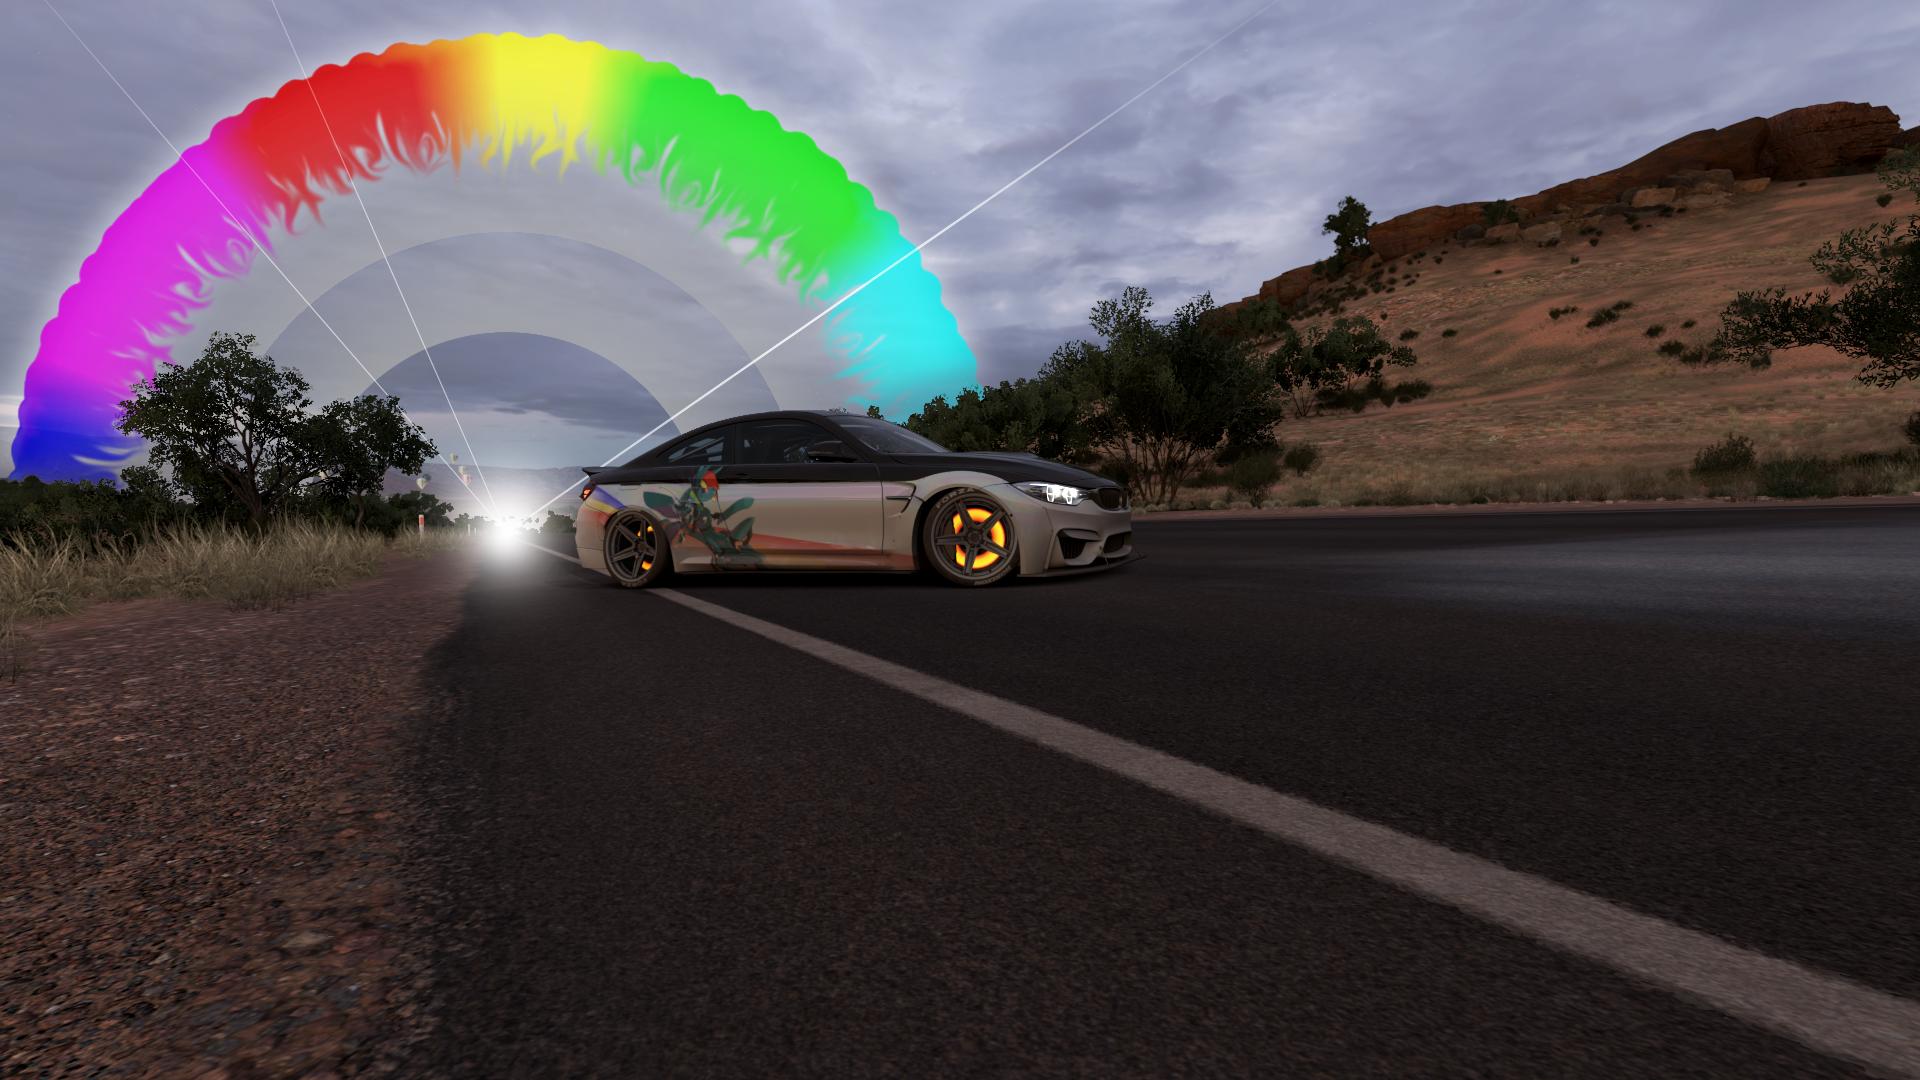 Forza Horizon 3 BMW M4 Coupe Rainboom Wallpaper by benny4683